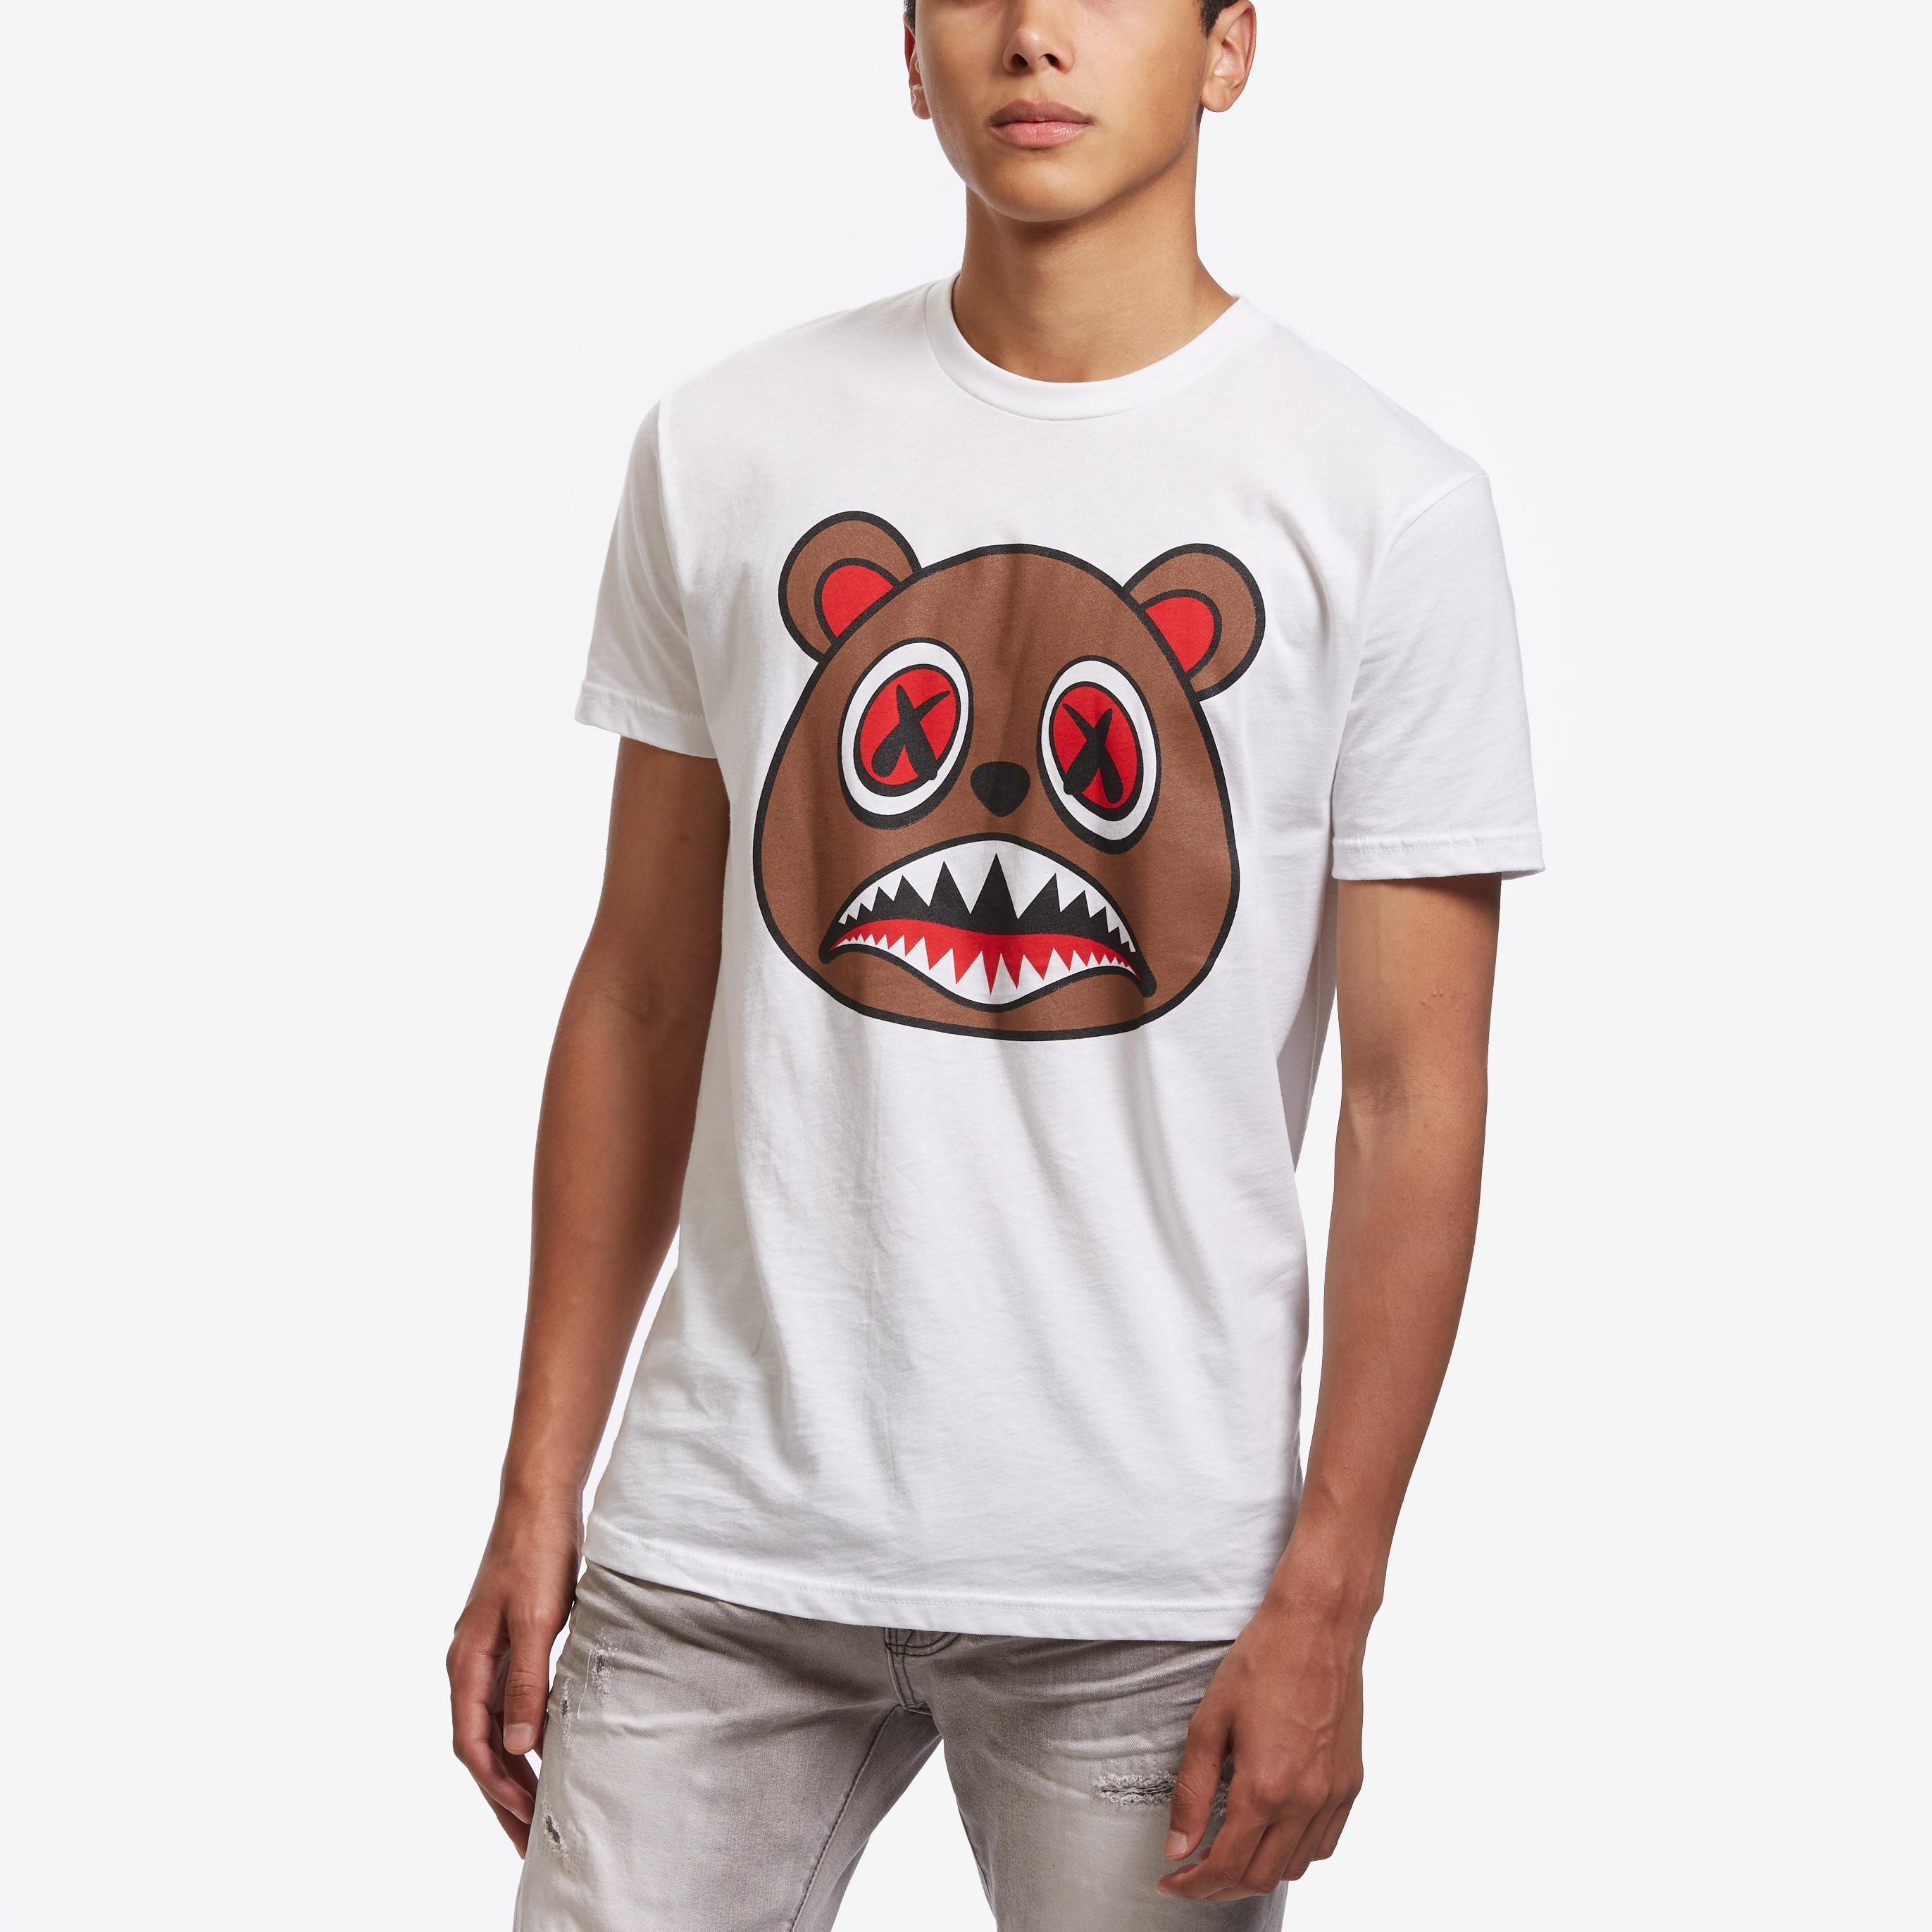 Cinnamon Baws T- Shirt